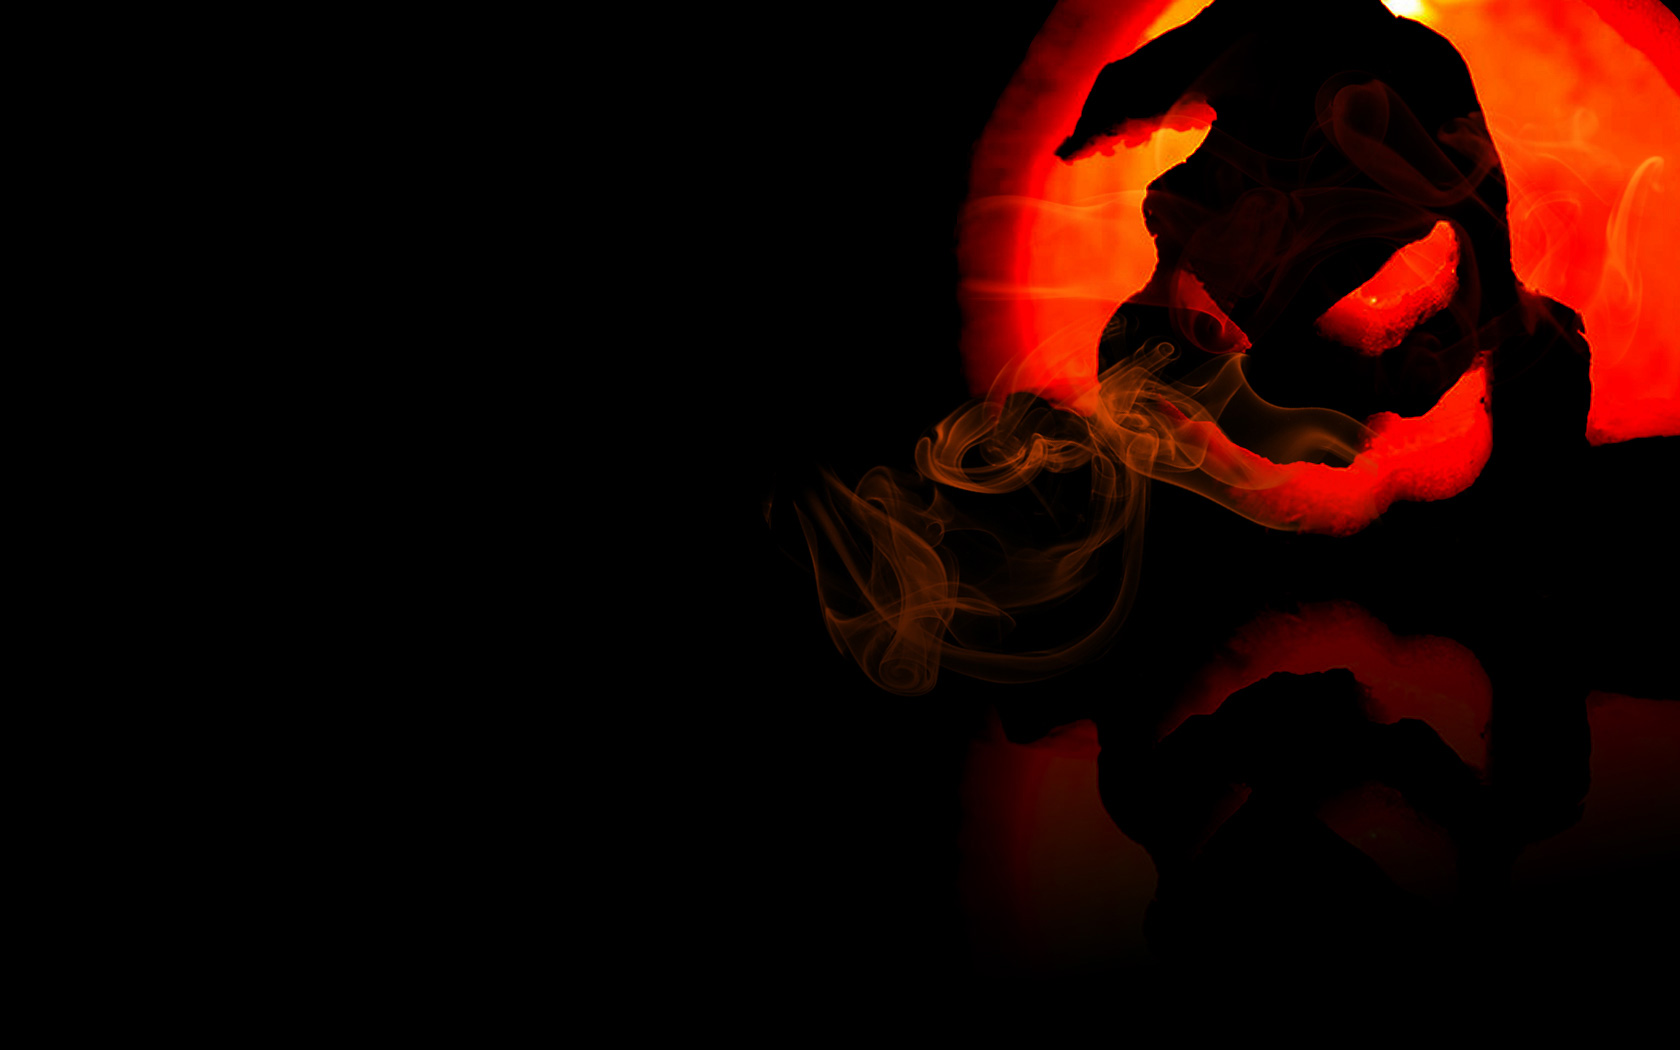 More Beautiful Halloween Wallpaper FLgrx Graphics 1680x1050